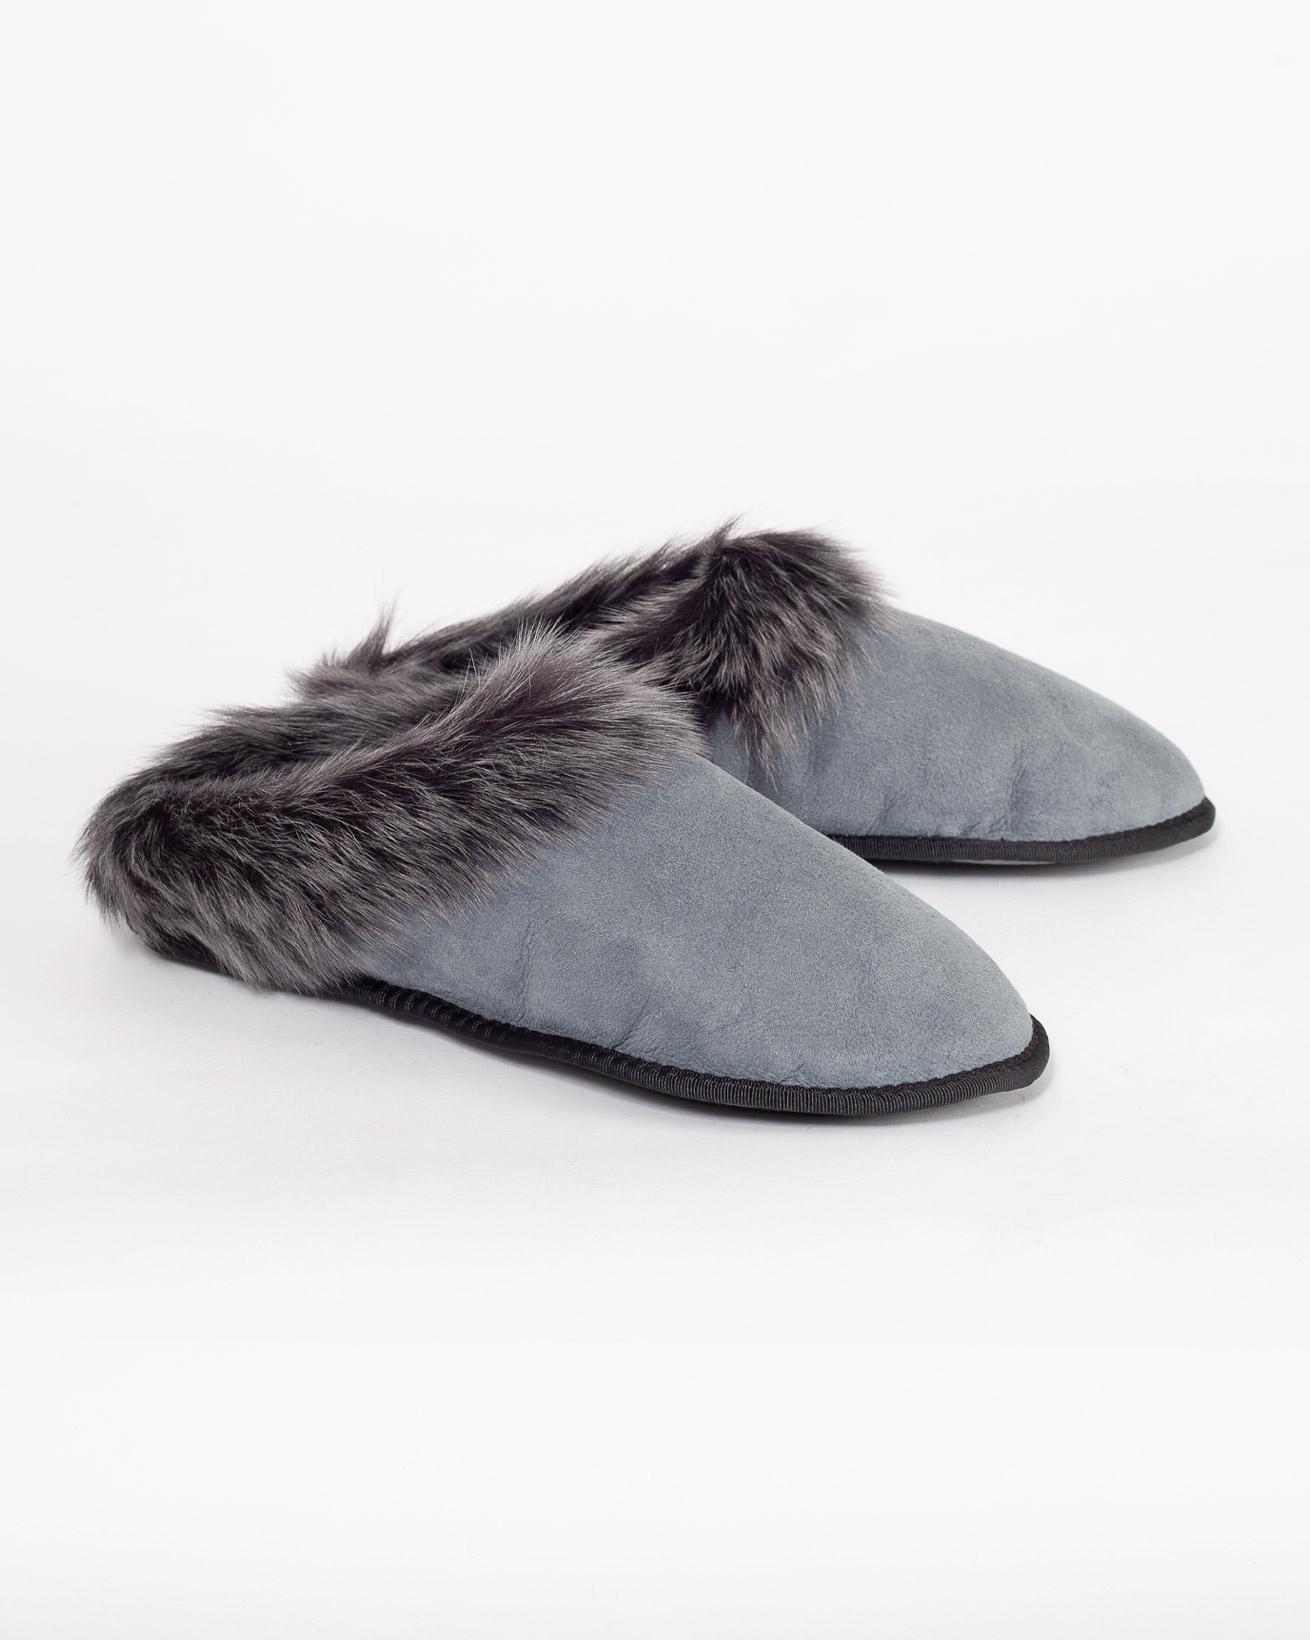 Toscana Cobi Slipper - Light Grey - Size 4 - 1217